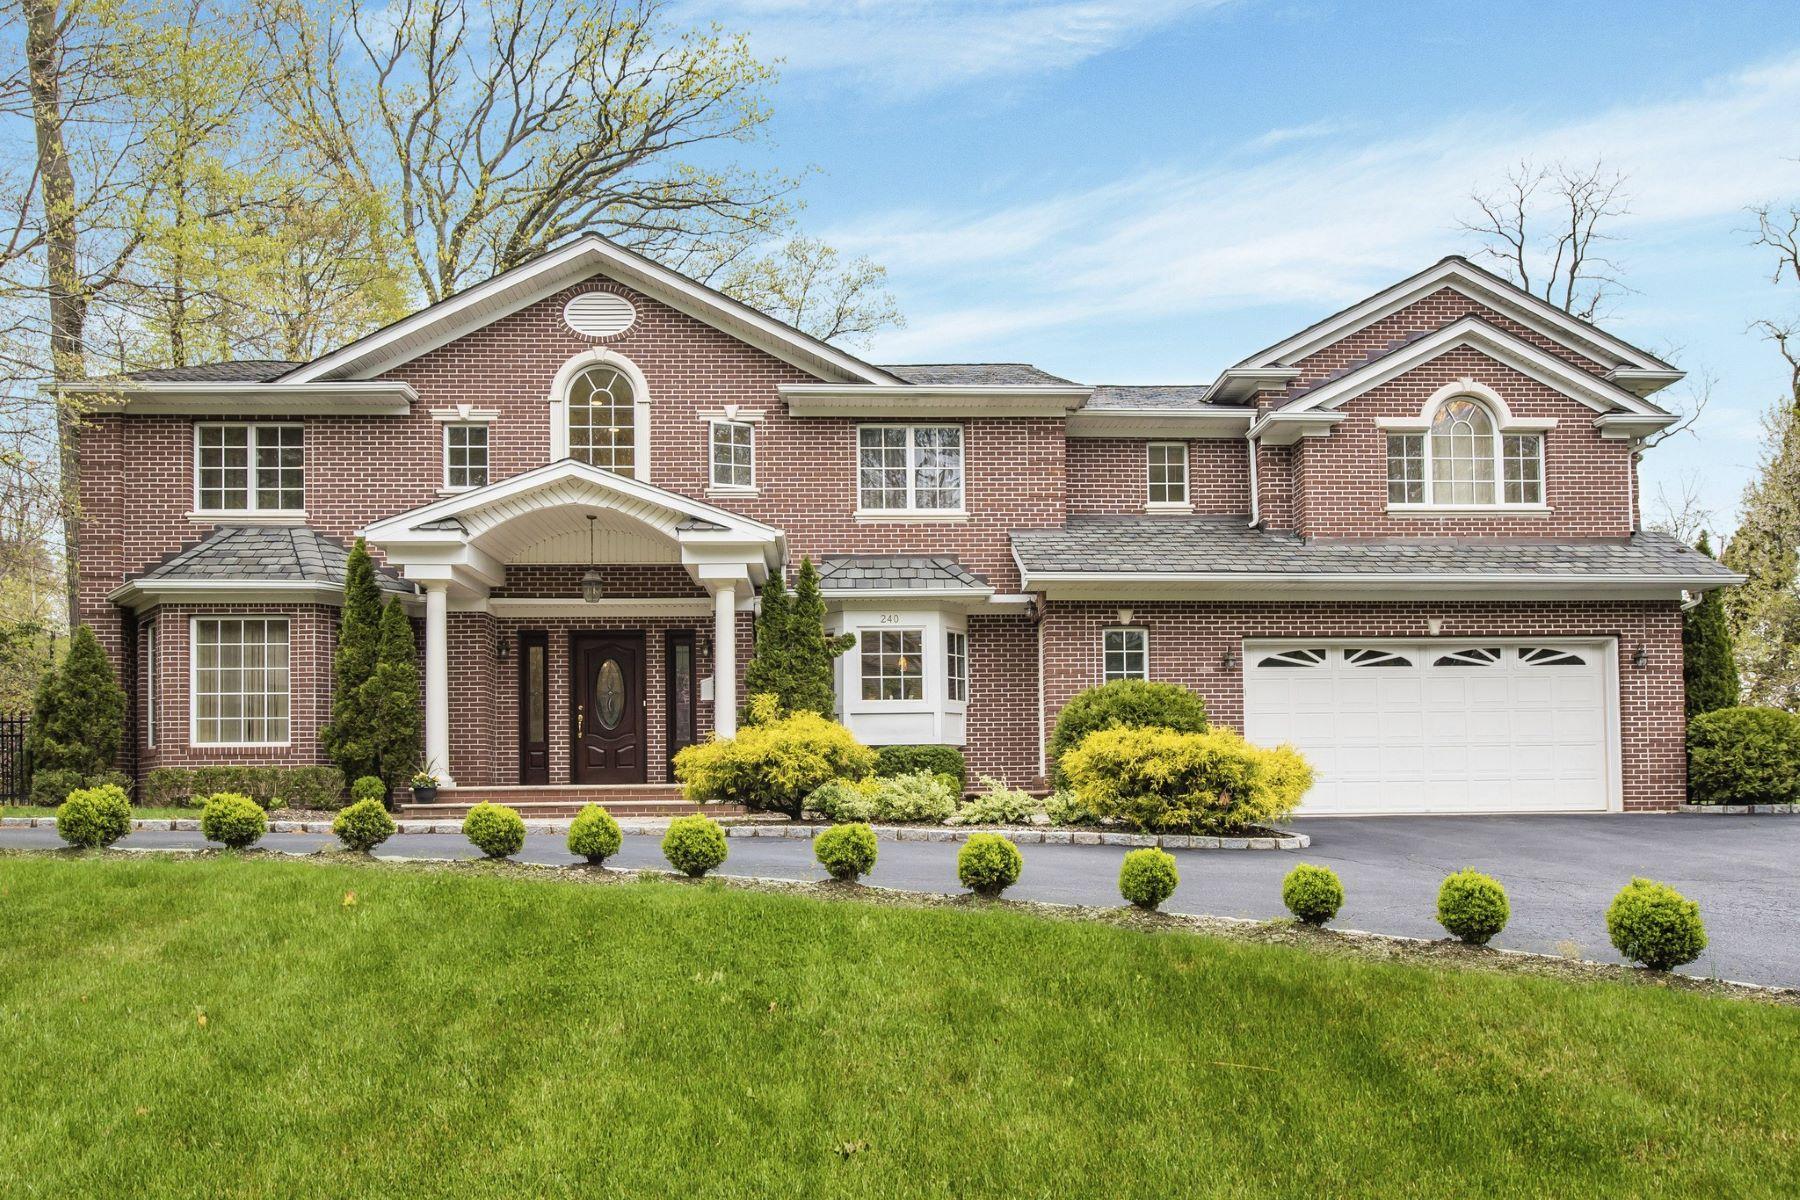 Single Family Homes for Sale at Roslyn 240 Chestnut Dr Roslyn, New York 11576 United States